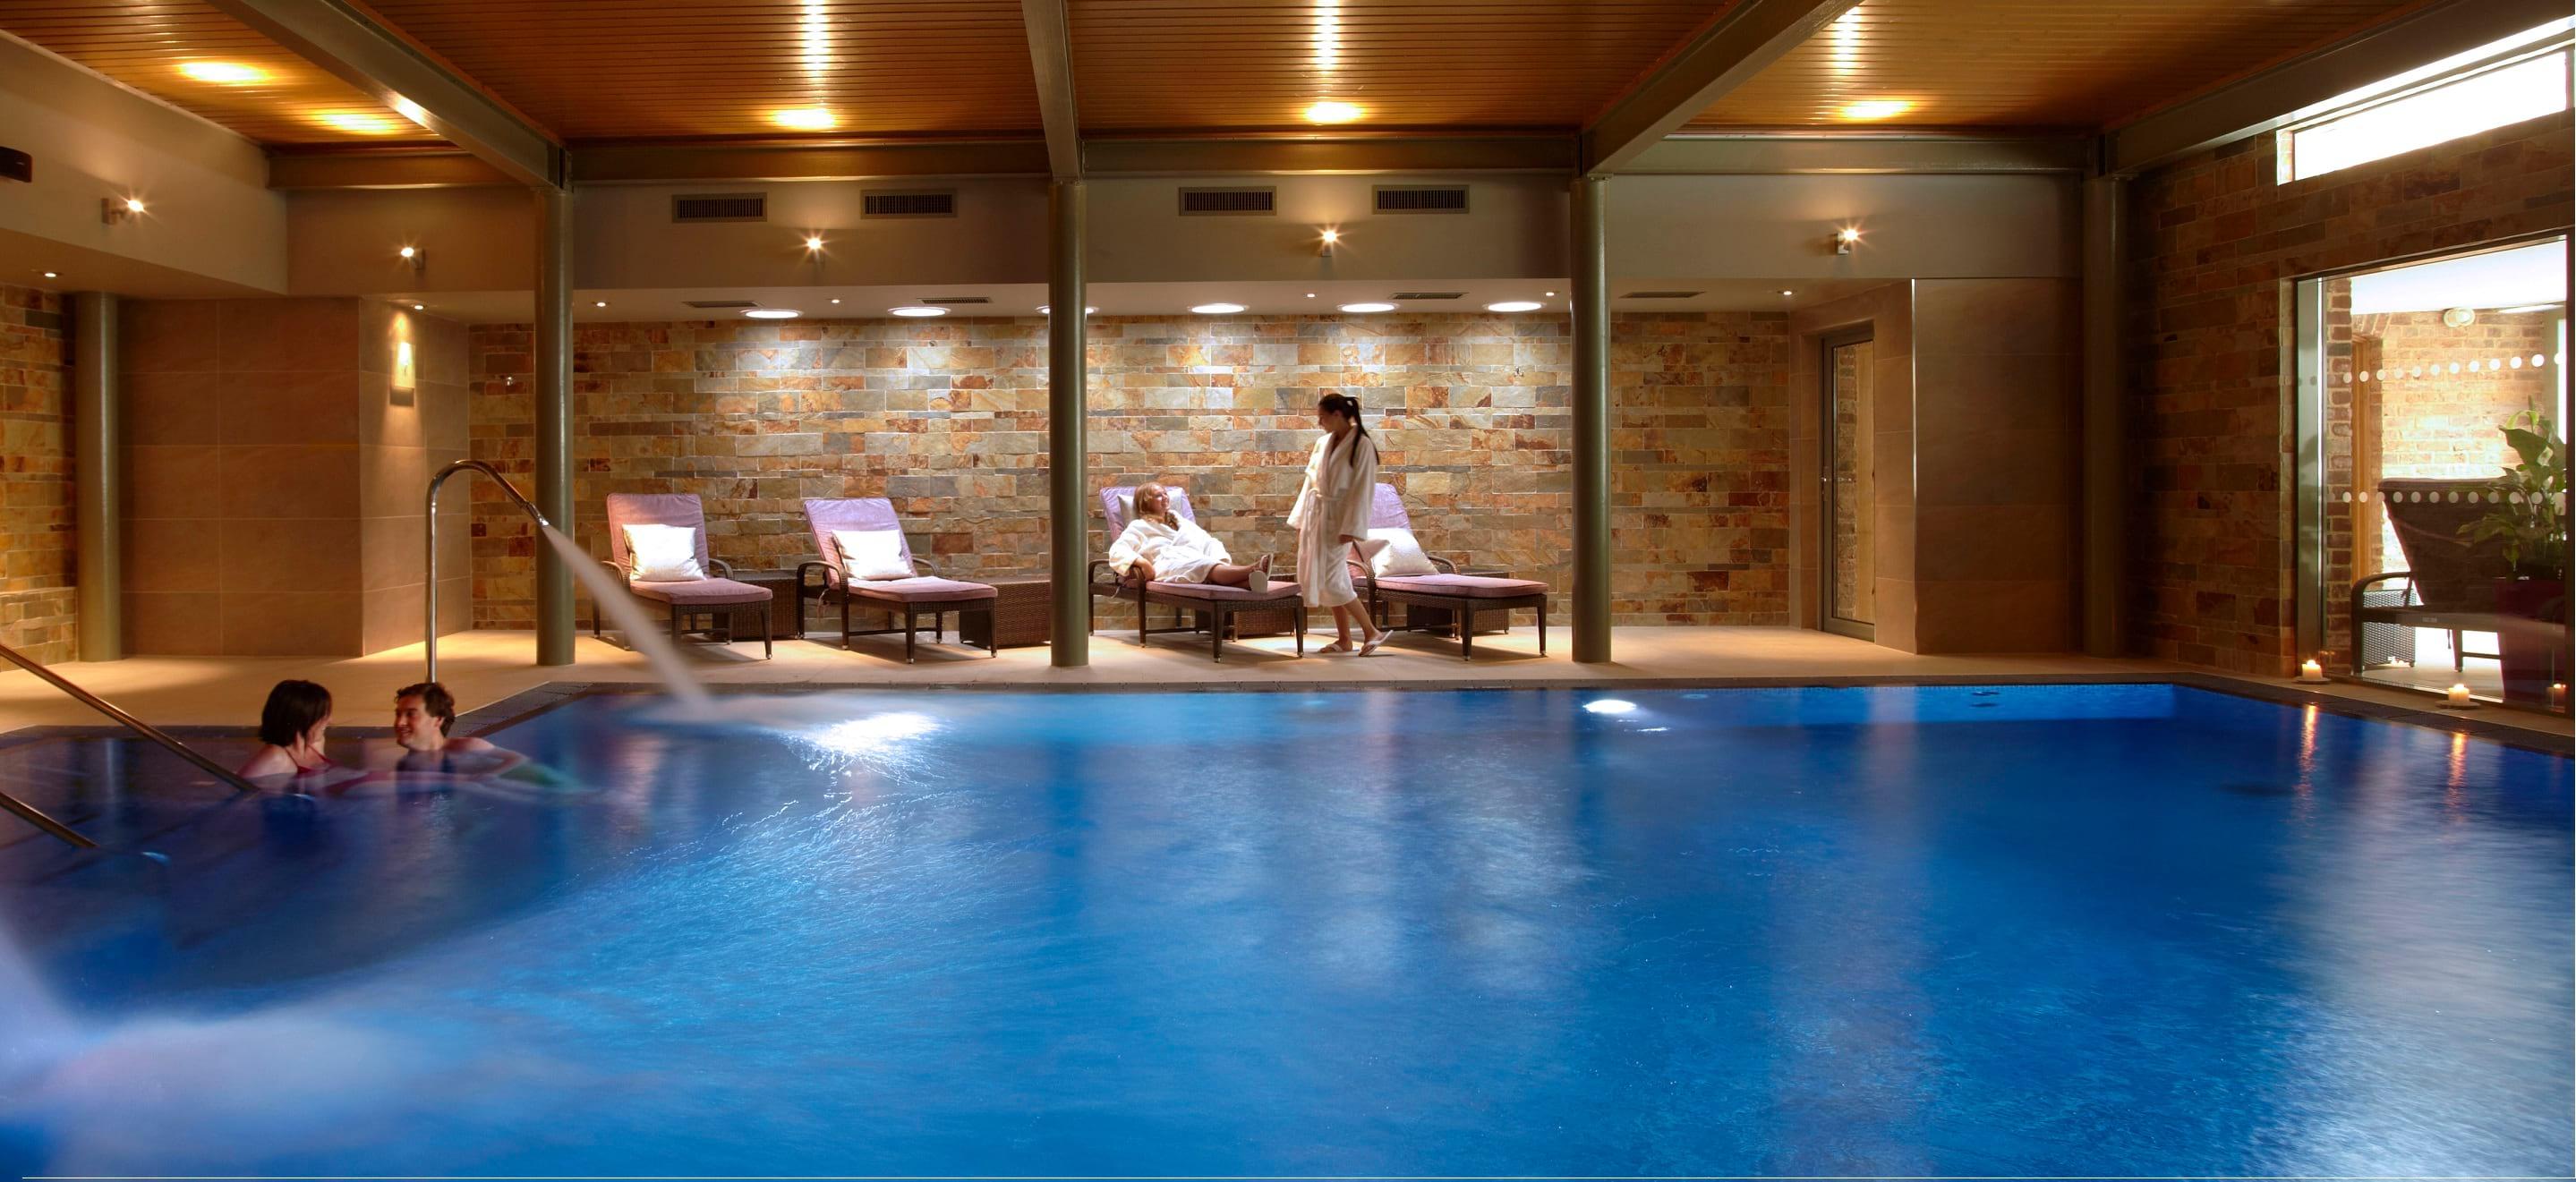 Pool at Elan Spa Greenway